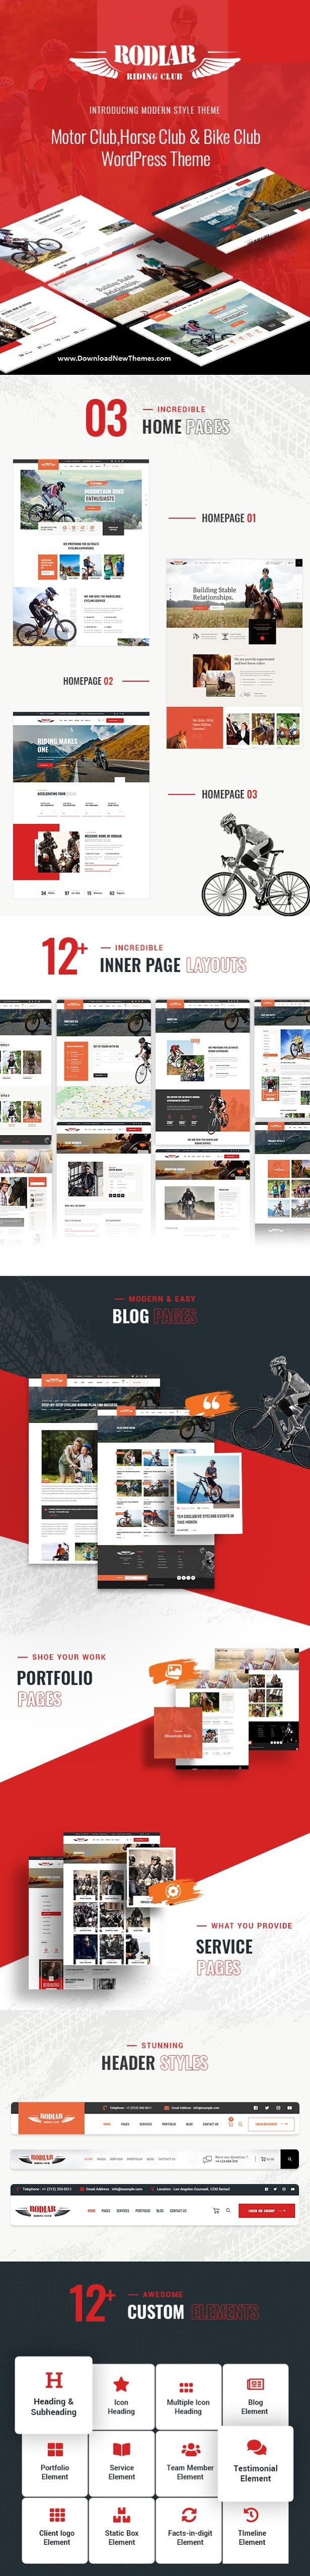 WordPress Theme for Rider's Club